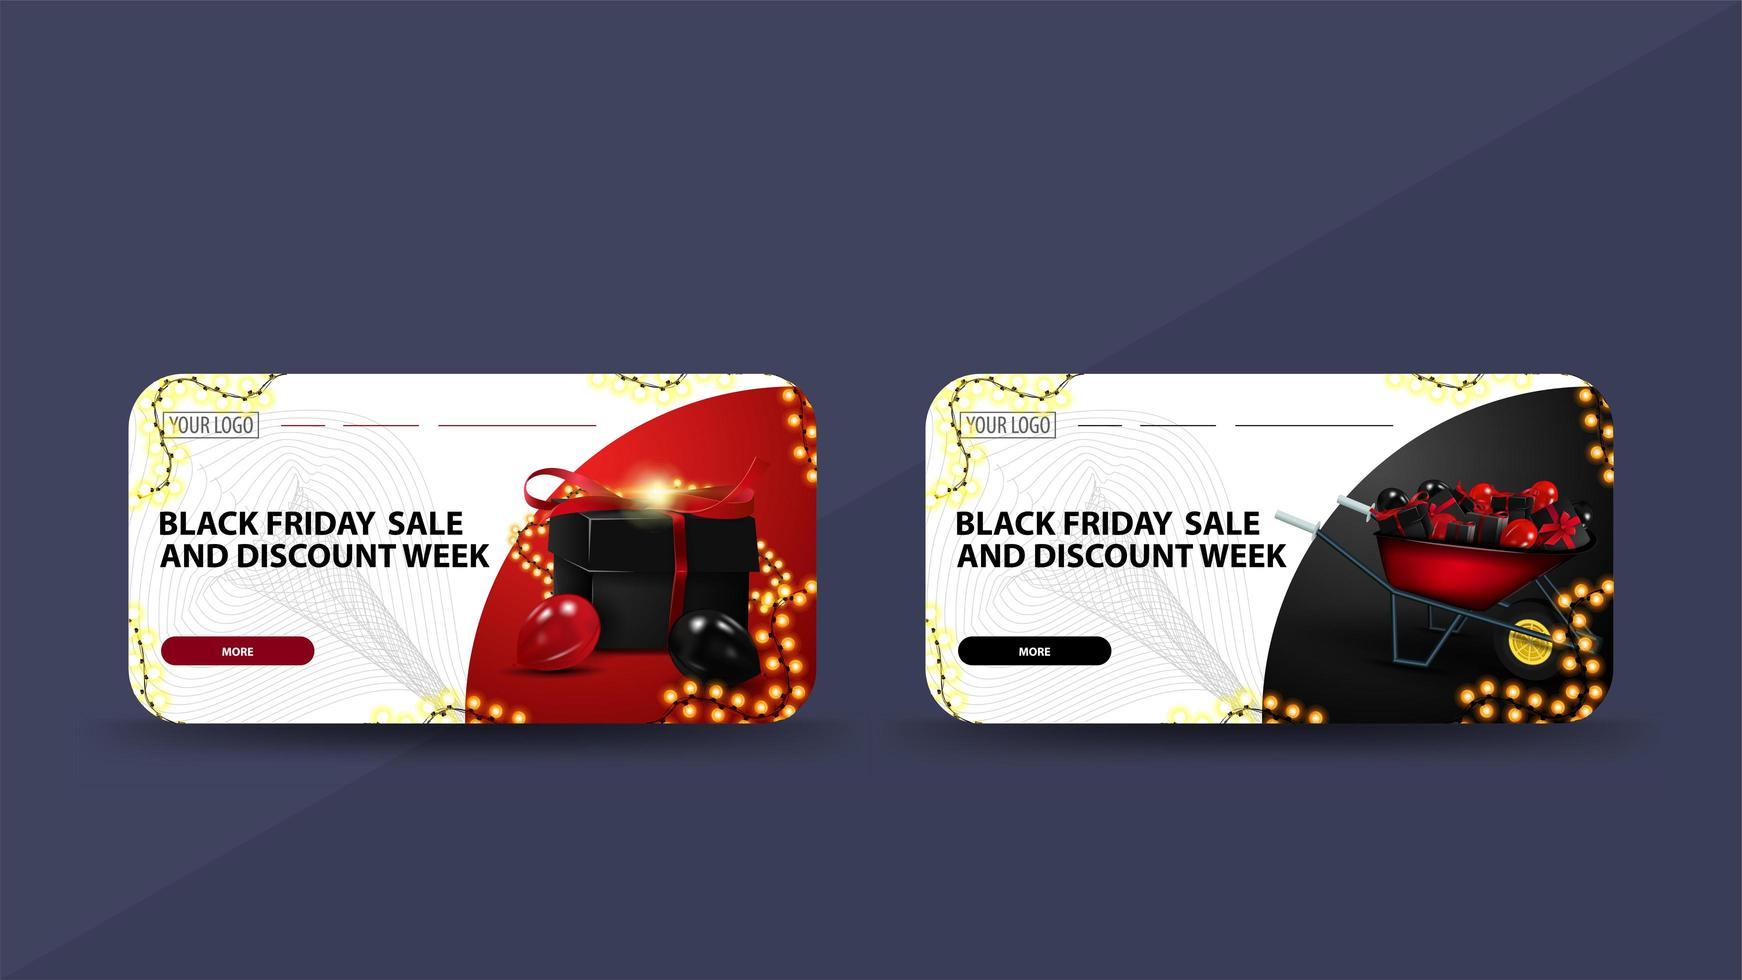 Black Friday Sale Kartenvorlagen vektor